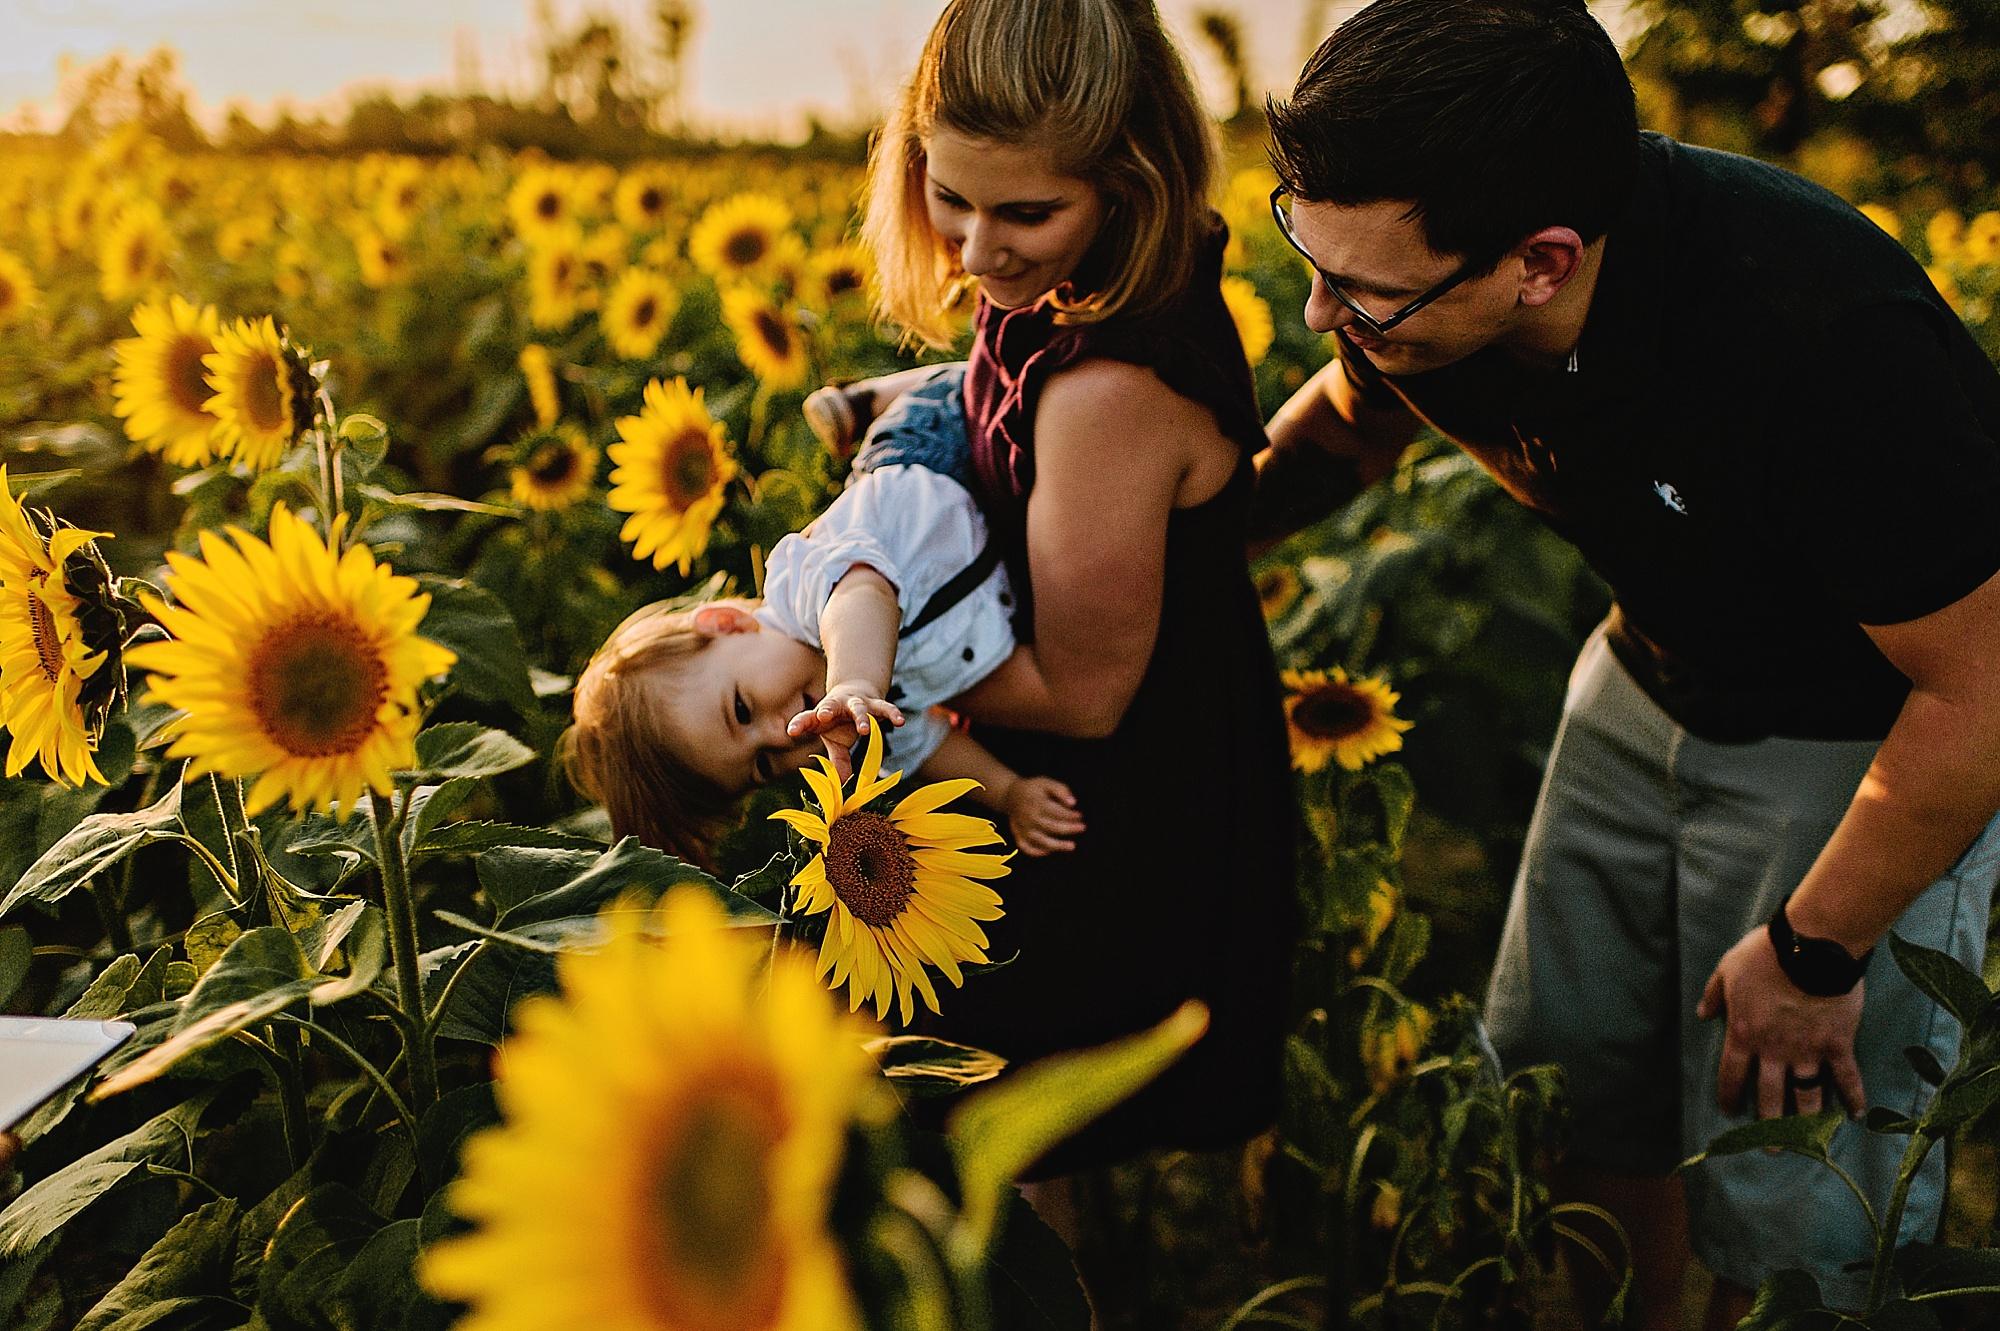 Schreiner-family-lauren-grayson-cleveland-photographer-sunflower-field-session_0025.jpg